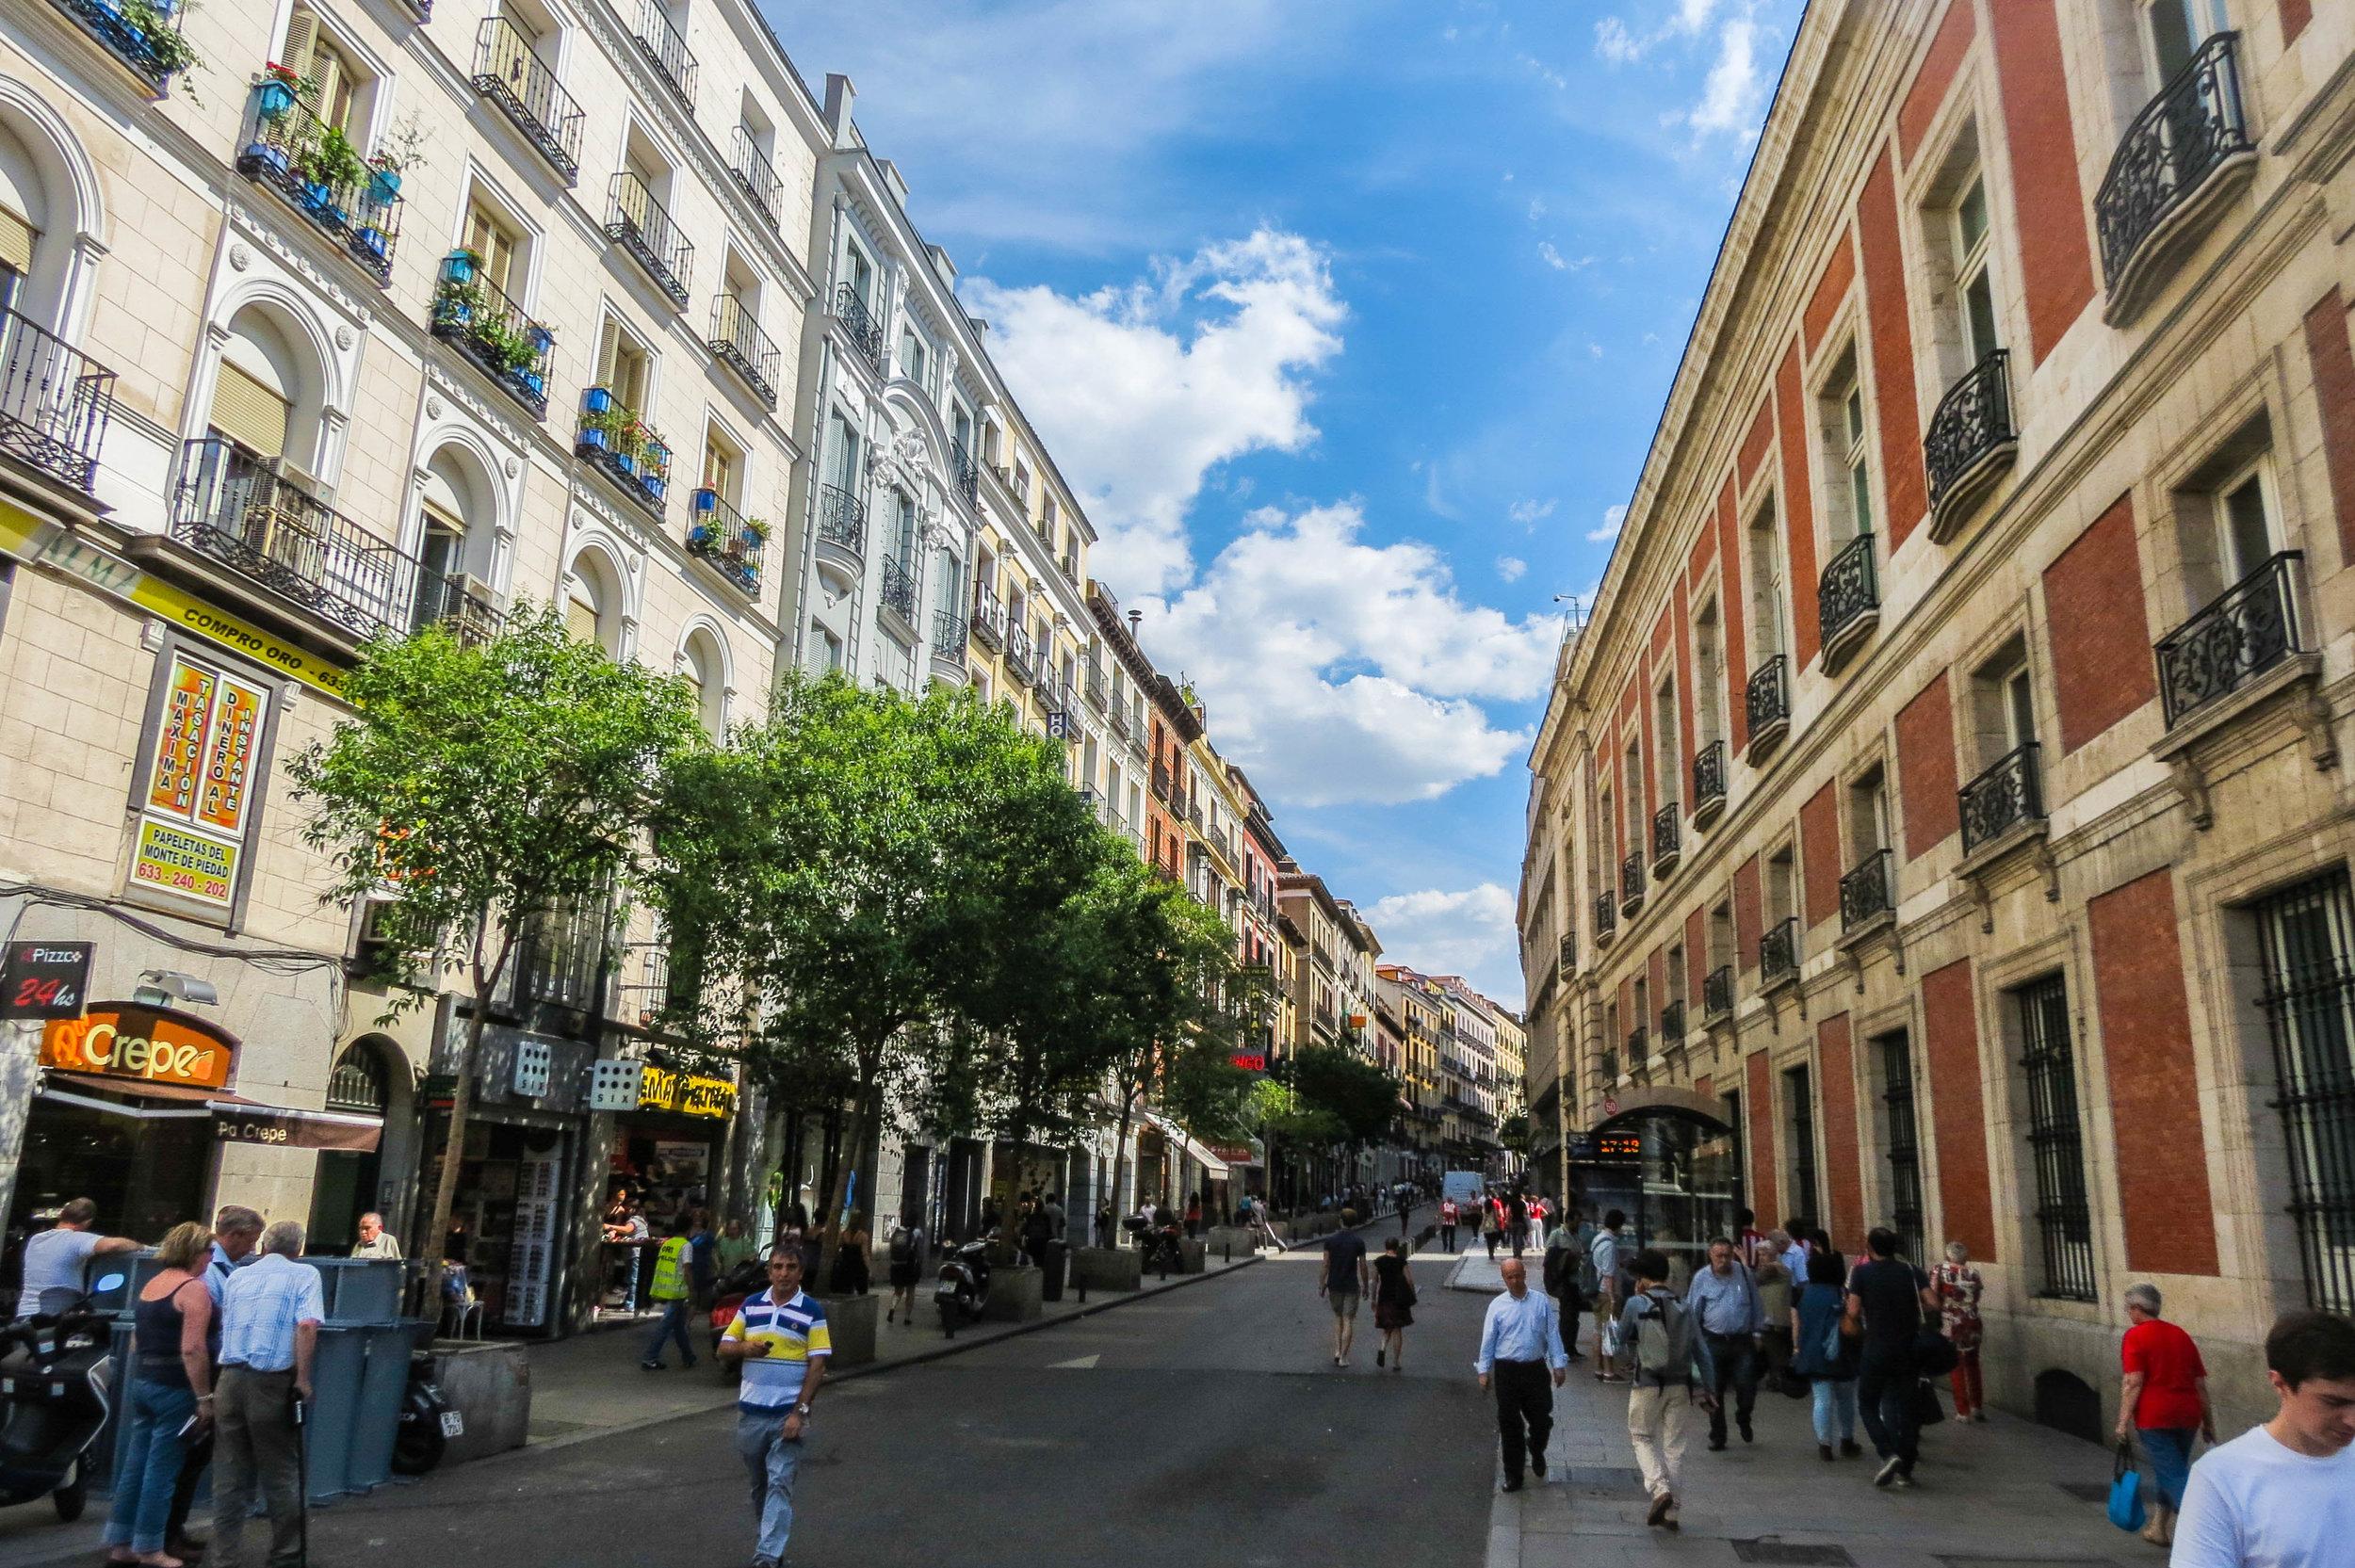 madrid-spain-streets-summer-22.jpg